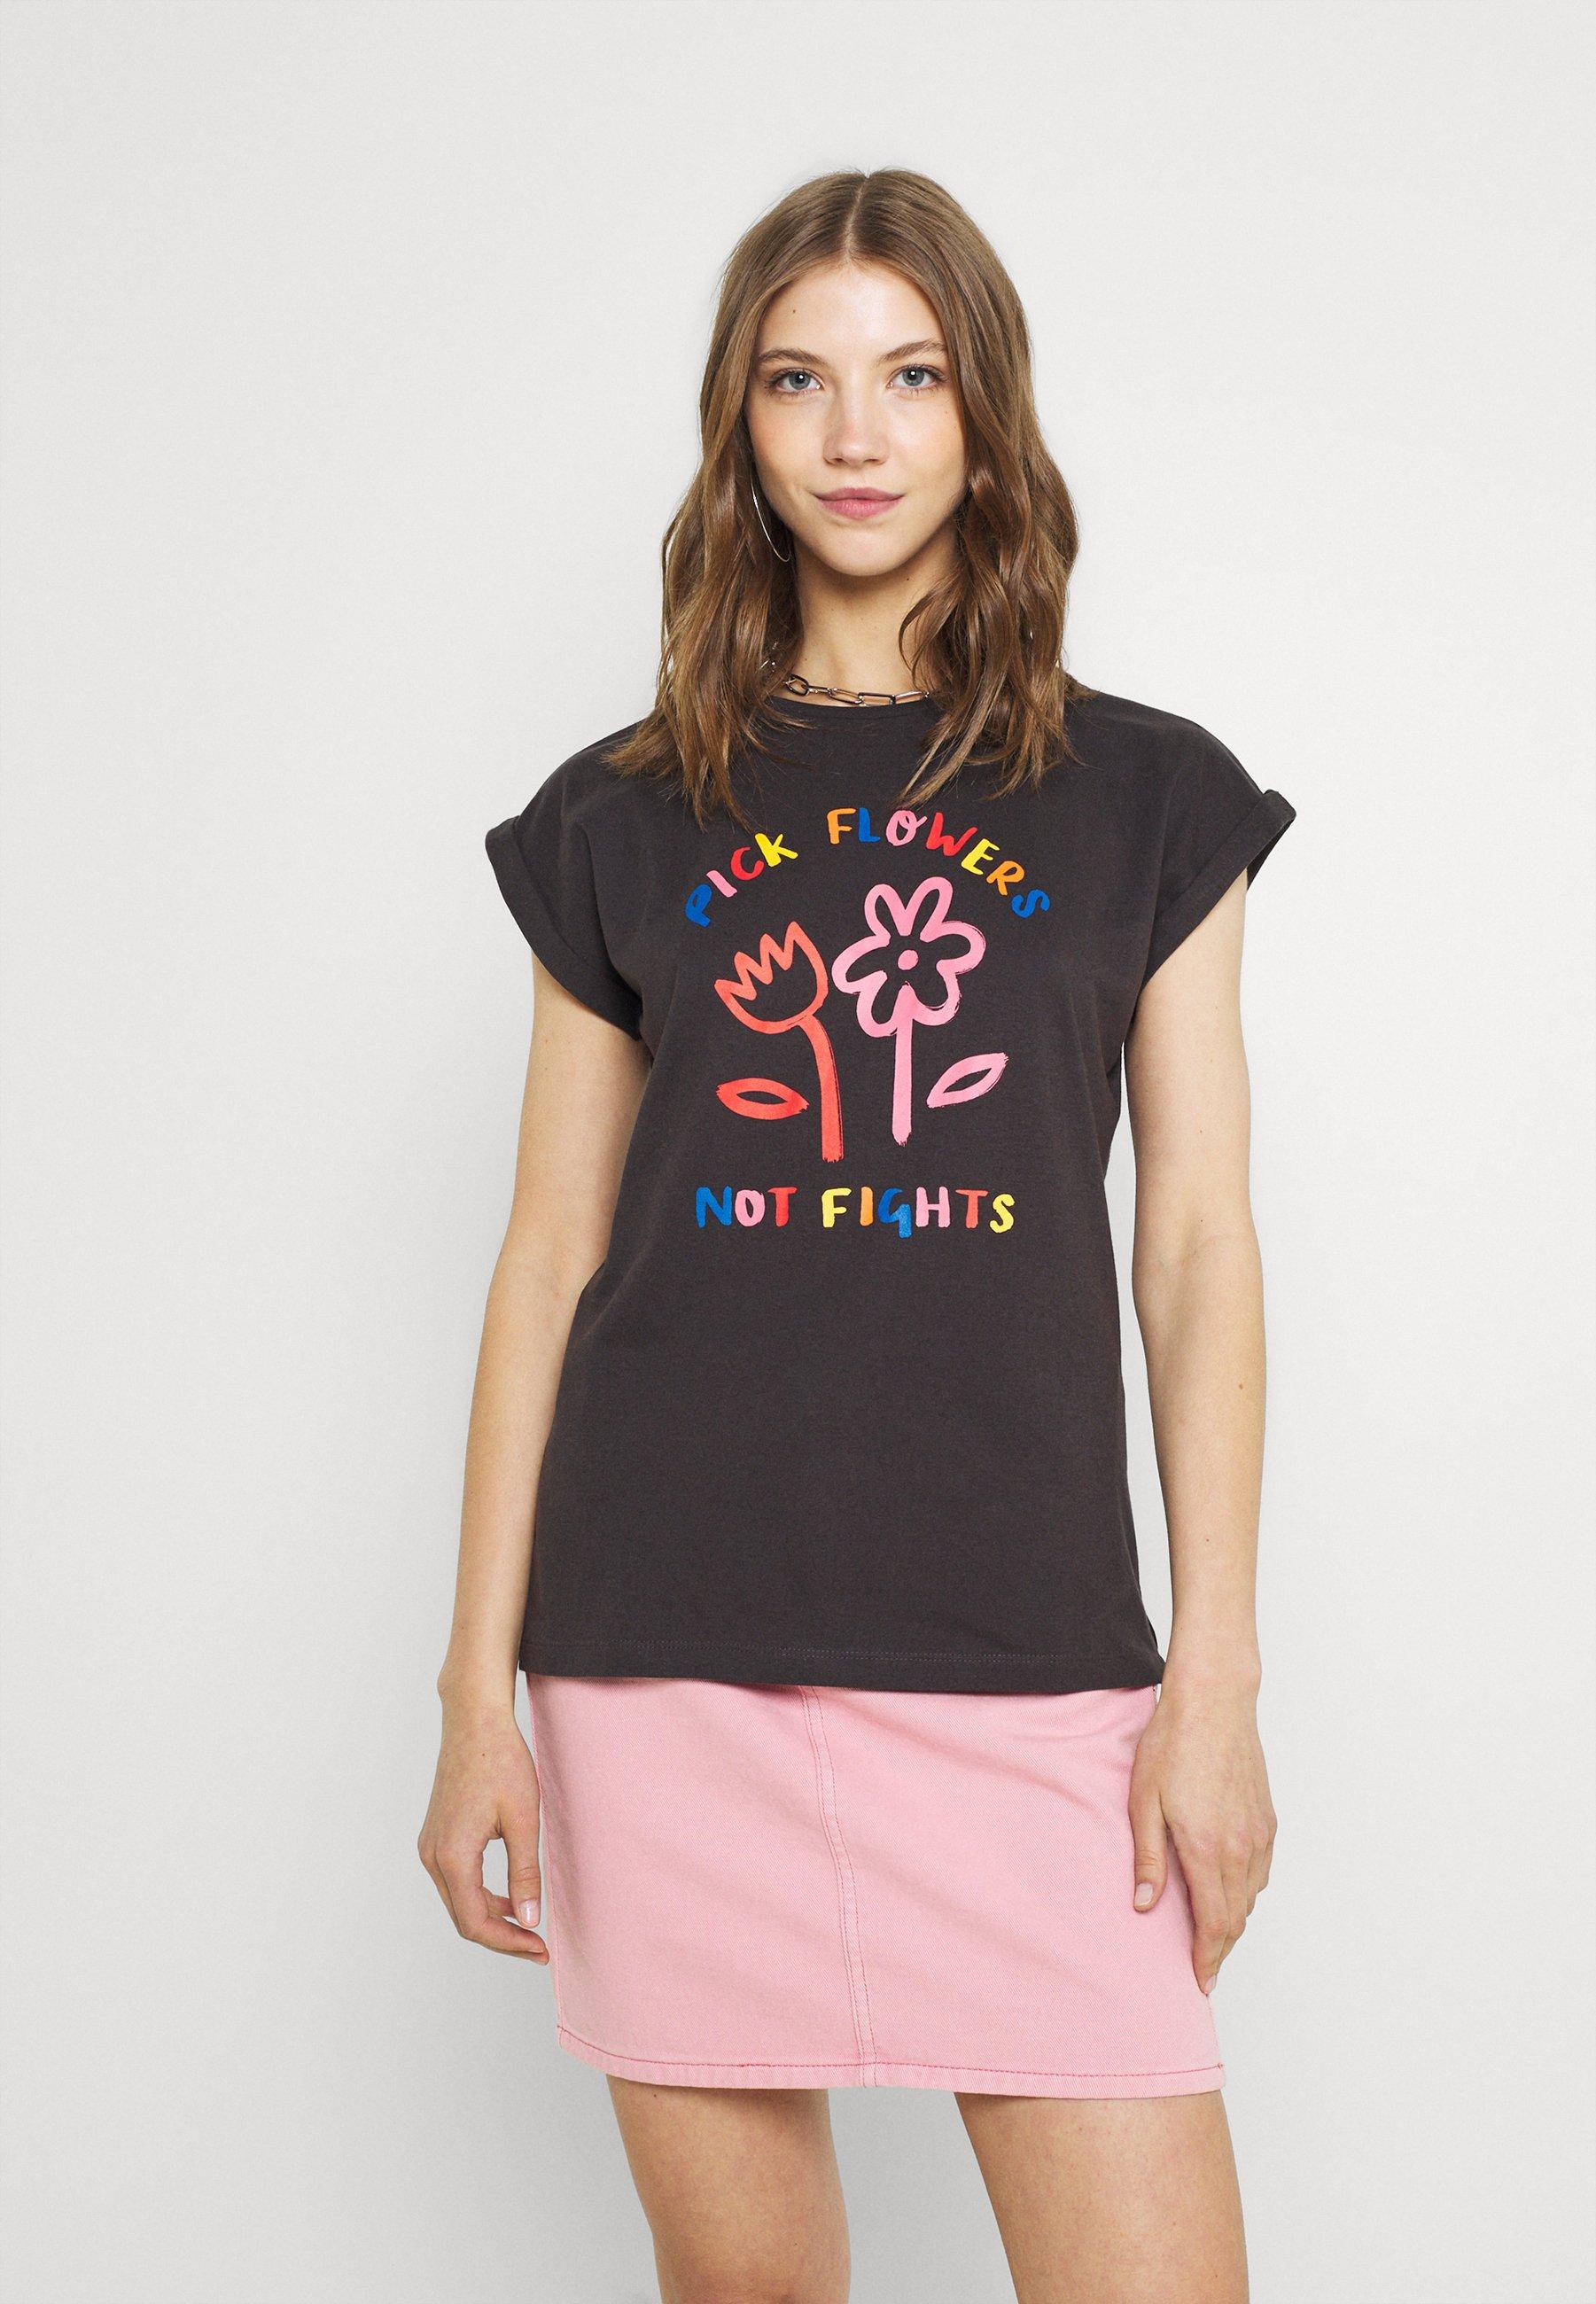 Femme VISBY FLOWERS NOT FIGHTS - T-shirt imprimé